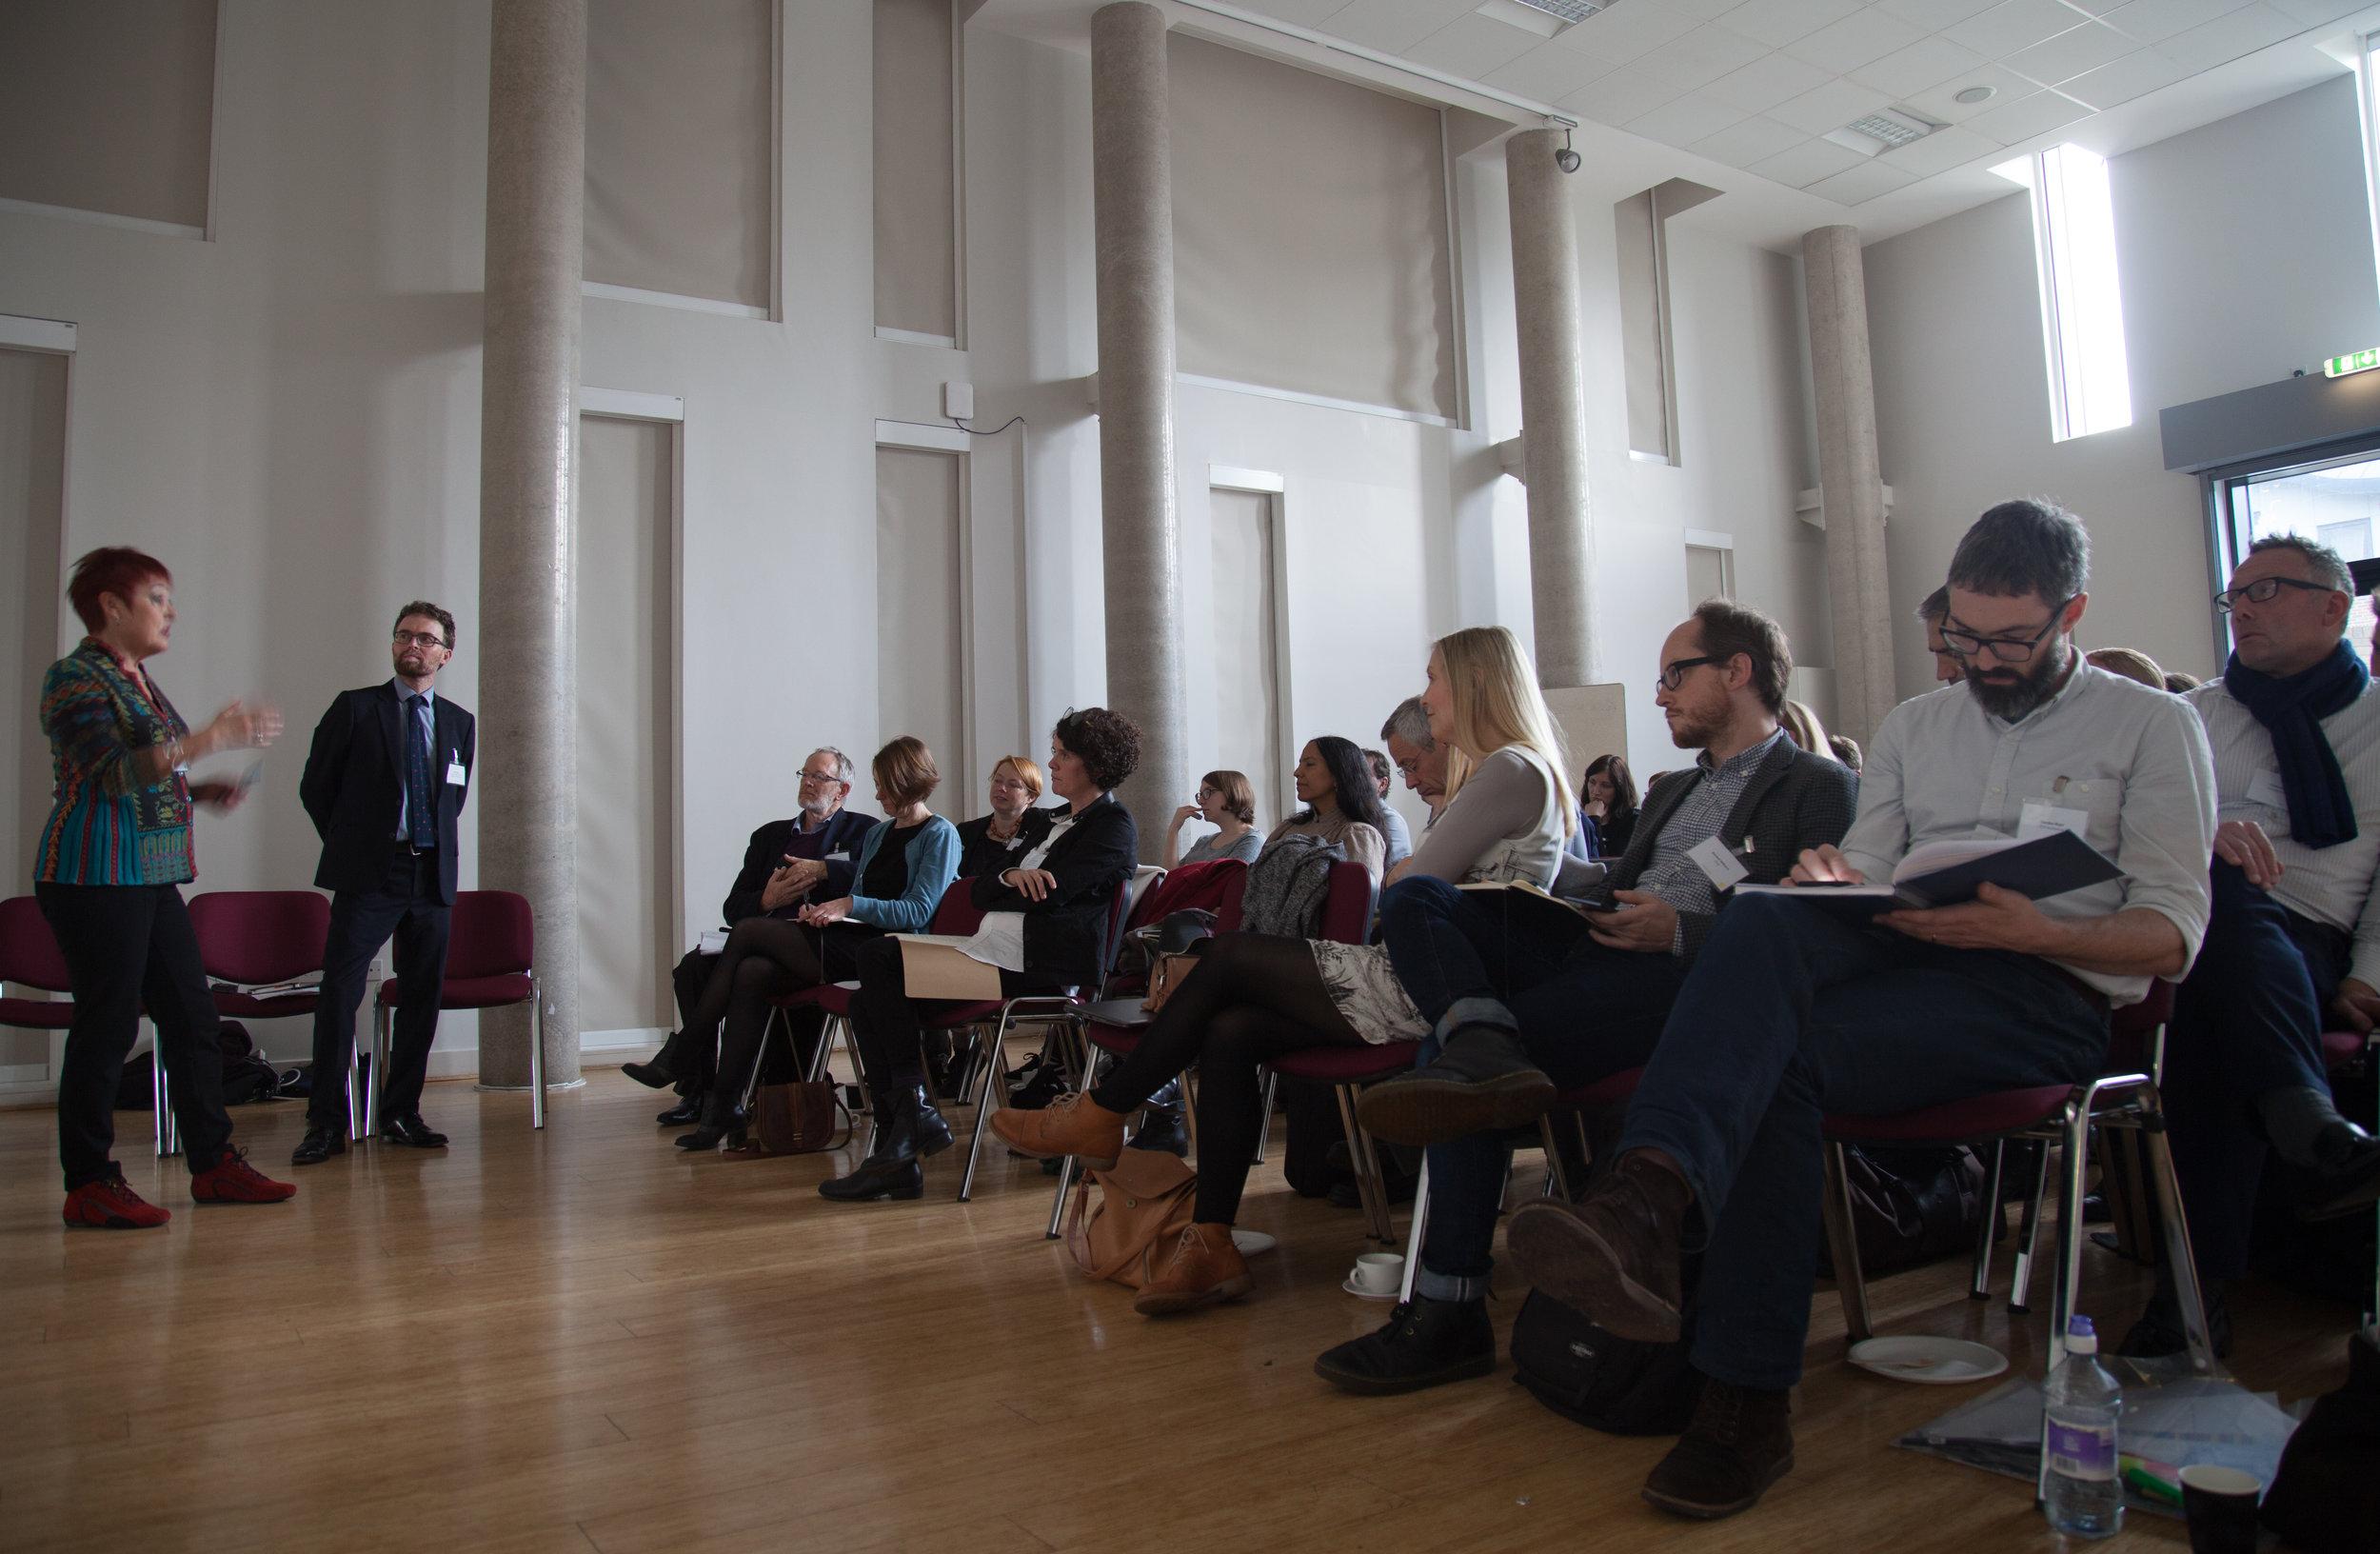 #hackney2026 . Delegates listen to a presentation by  Rita Wapperom  from  Rotterdam.